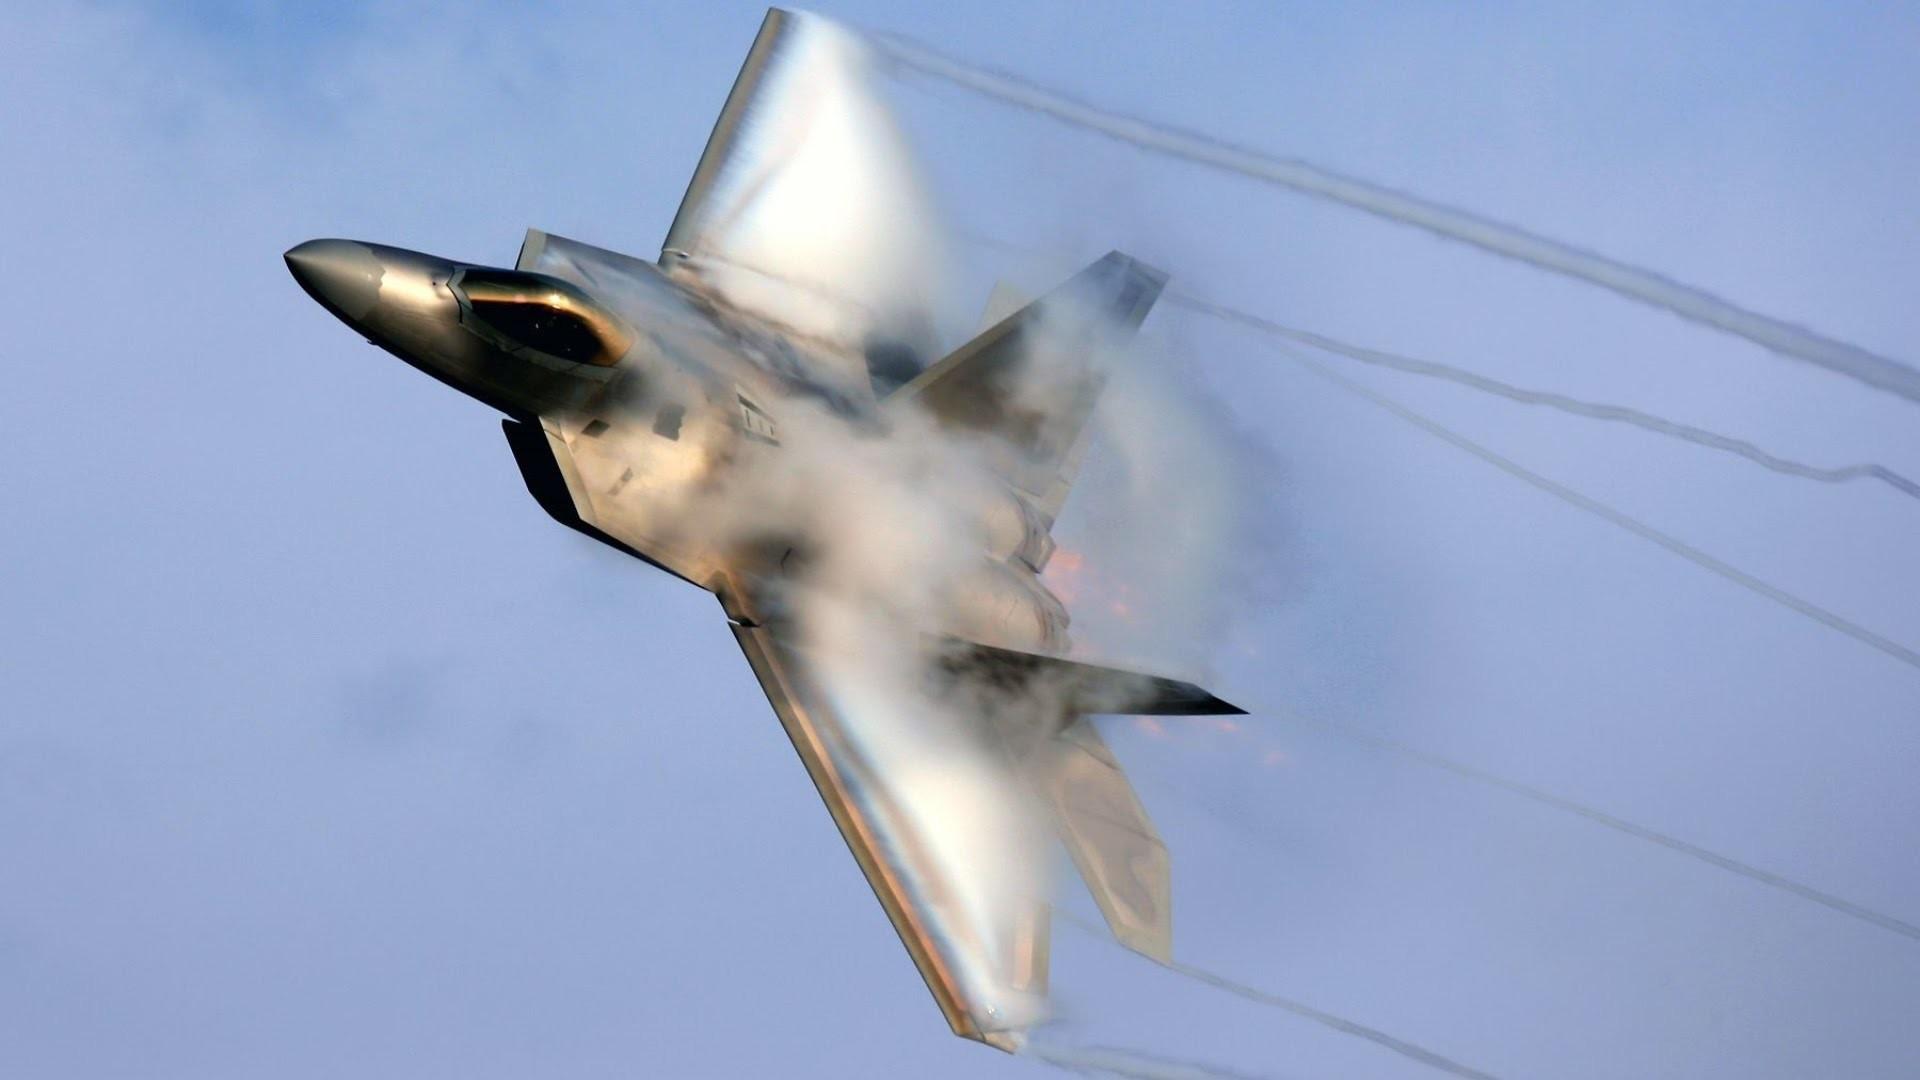 F 22 Raptor Wallpaper HD (75+ images)